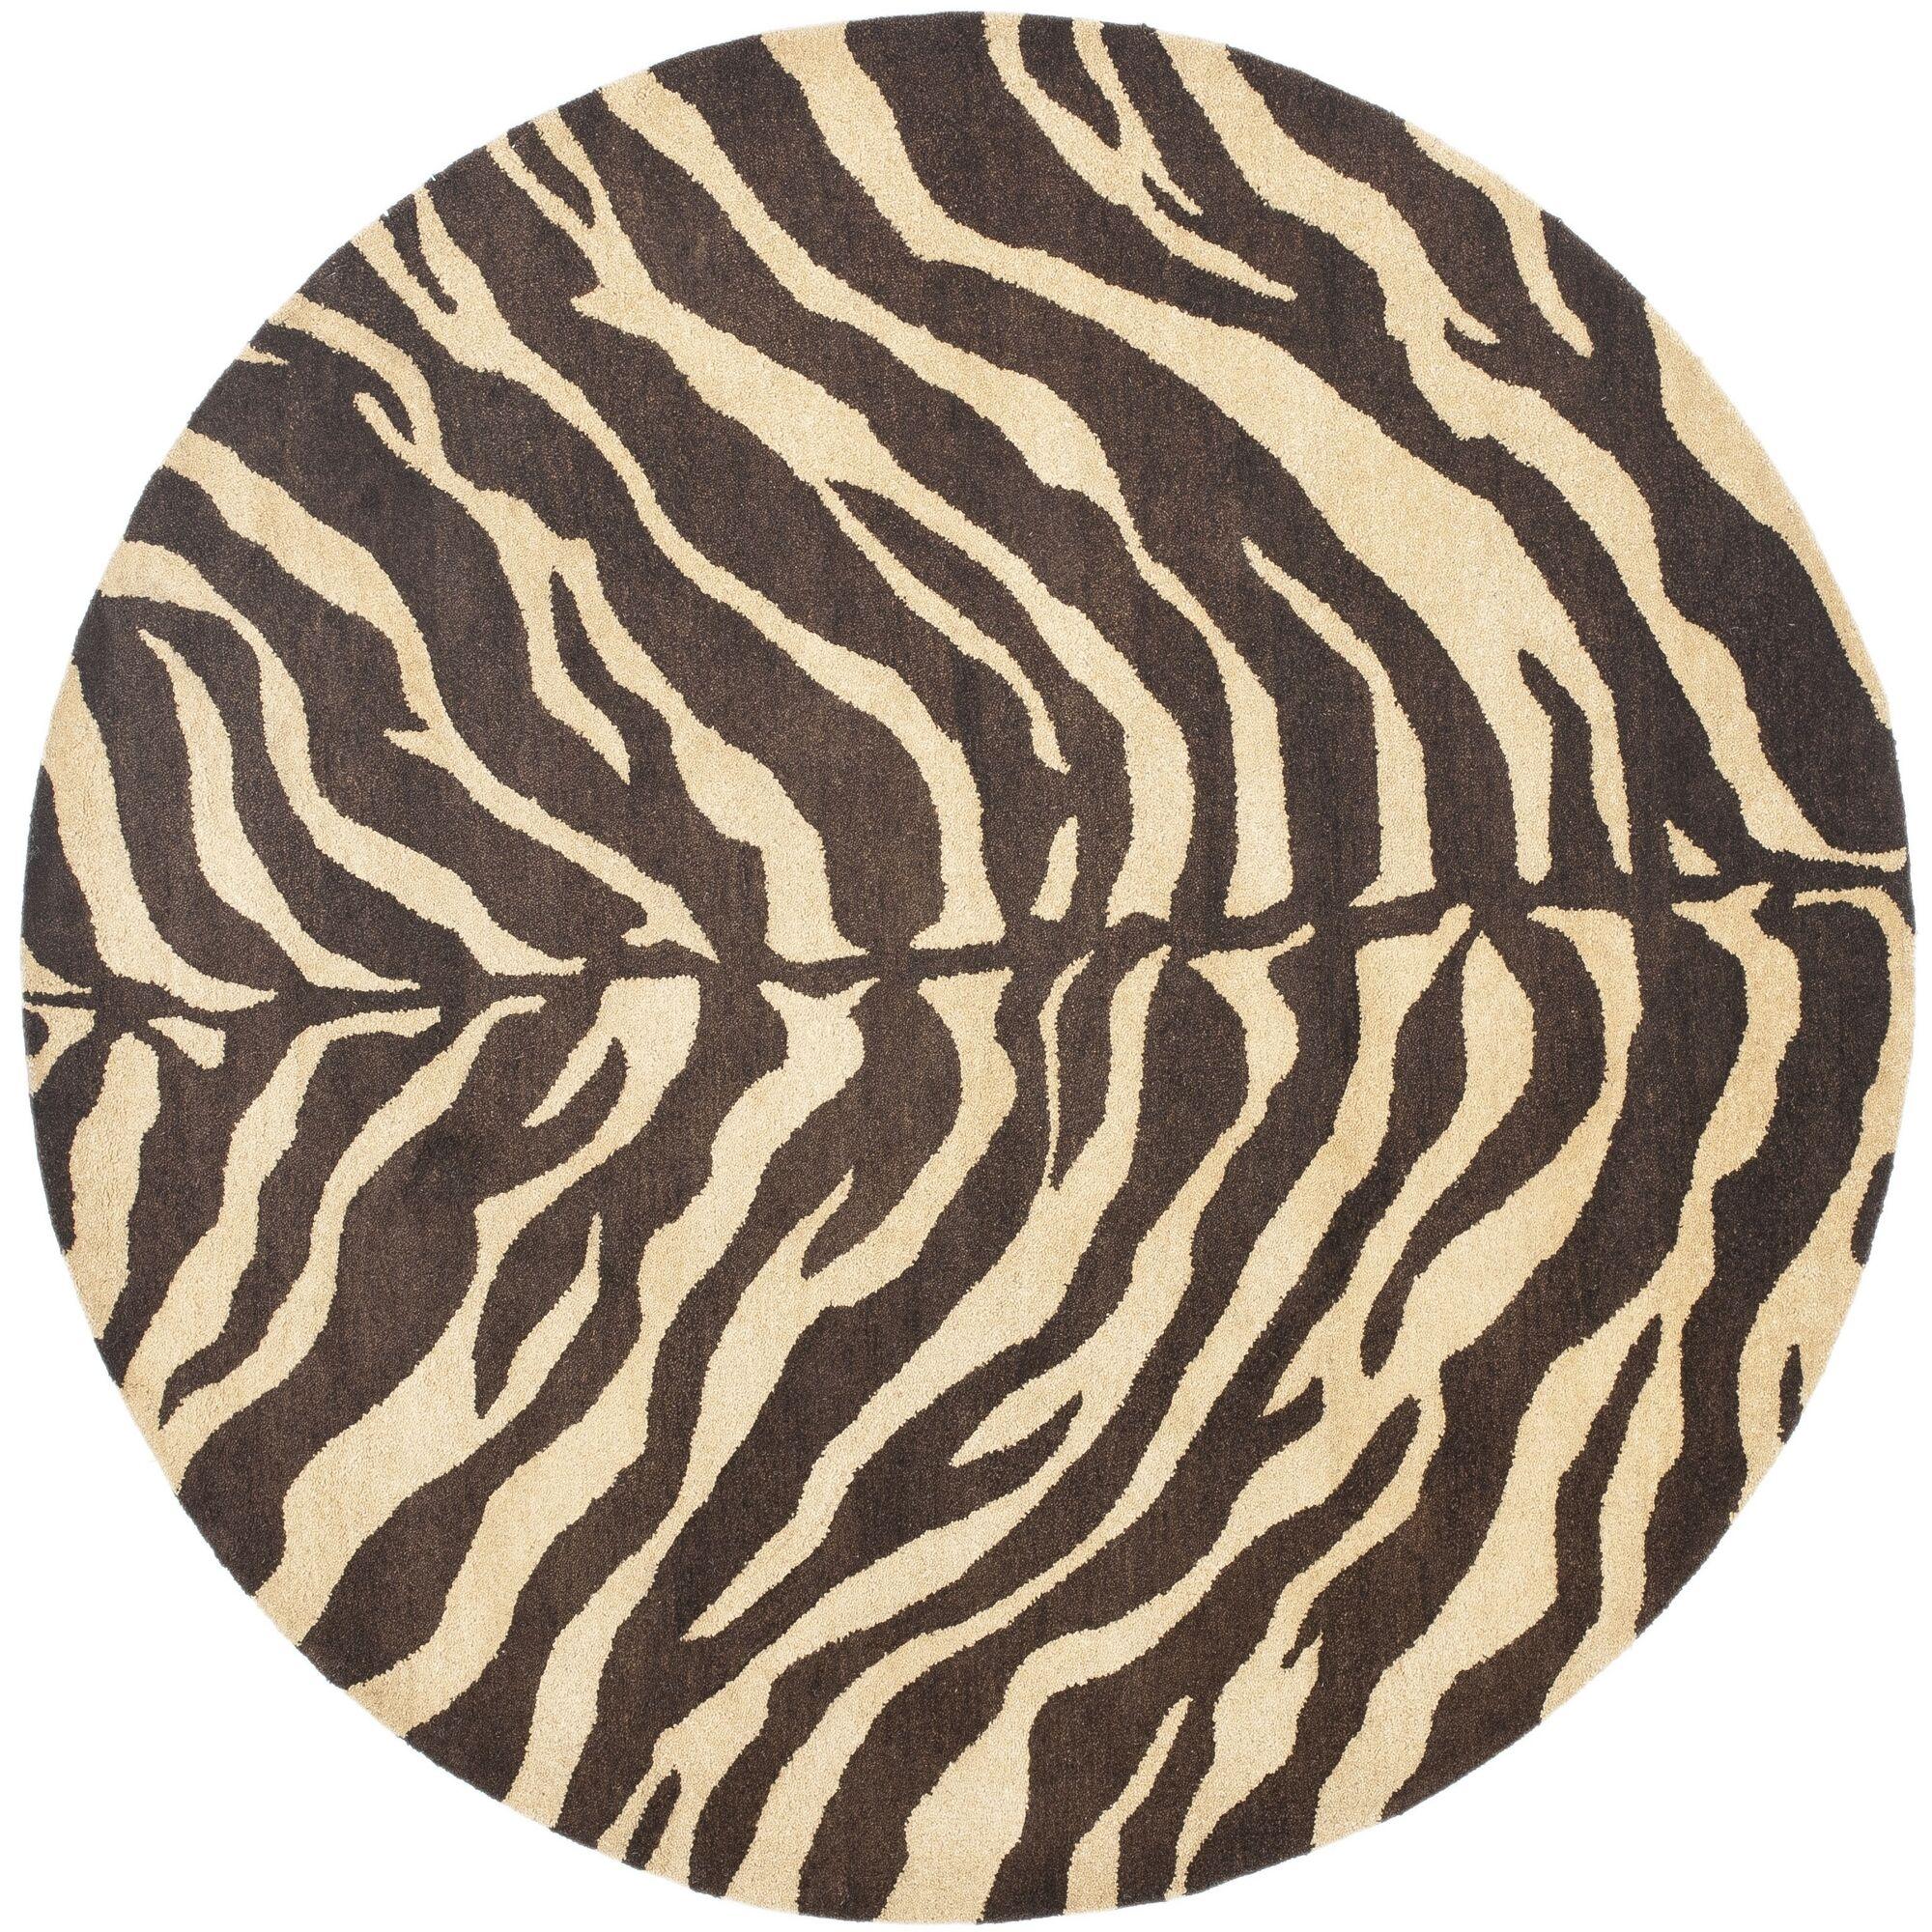 Bergama Beige/Brown Area Rug Rug Size: Round 8'